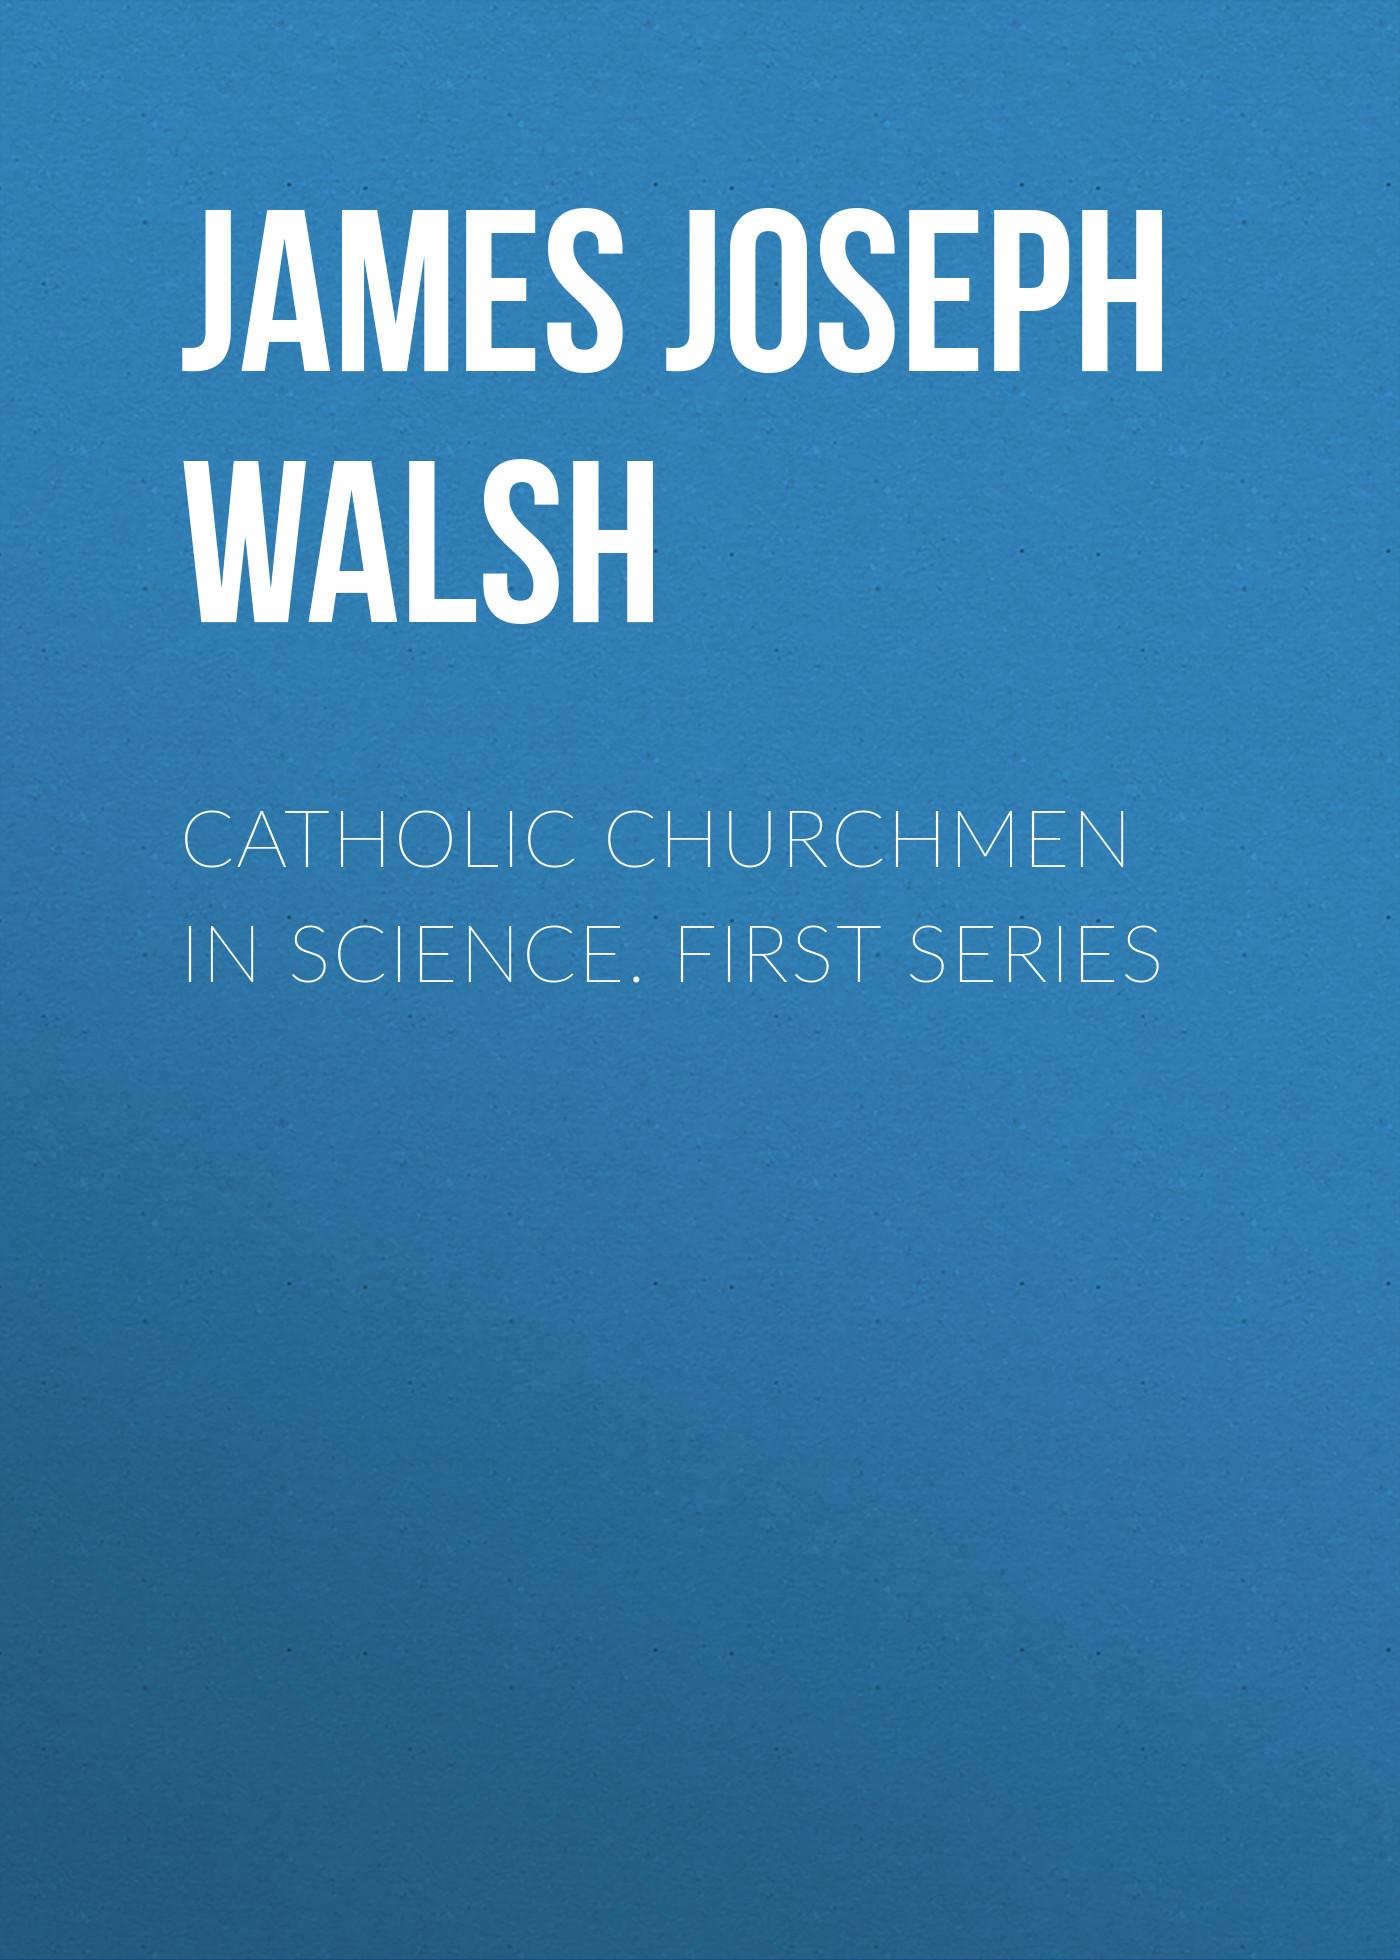 James Joseph Walsh Catholic Churchmen in Science. First Series